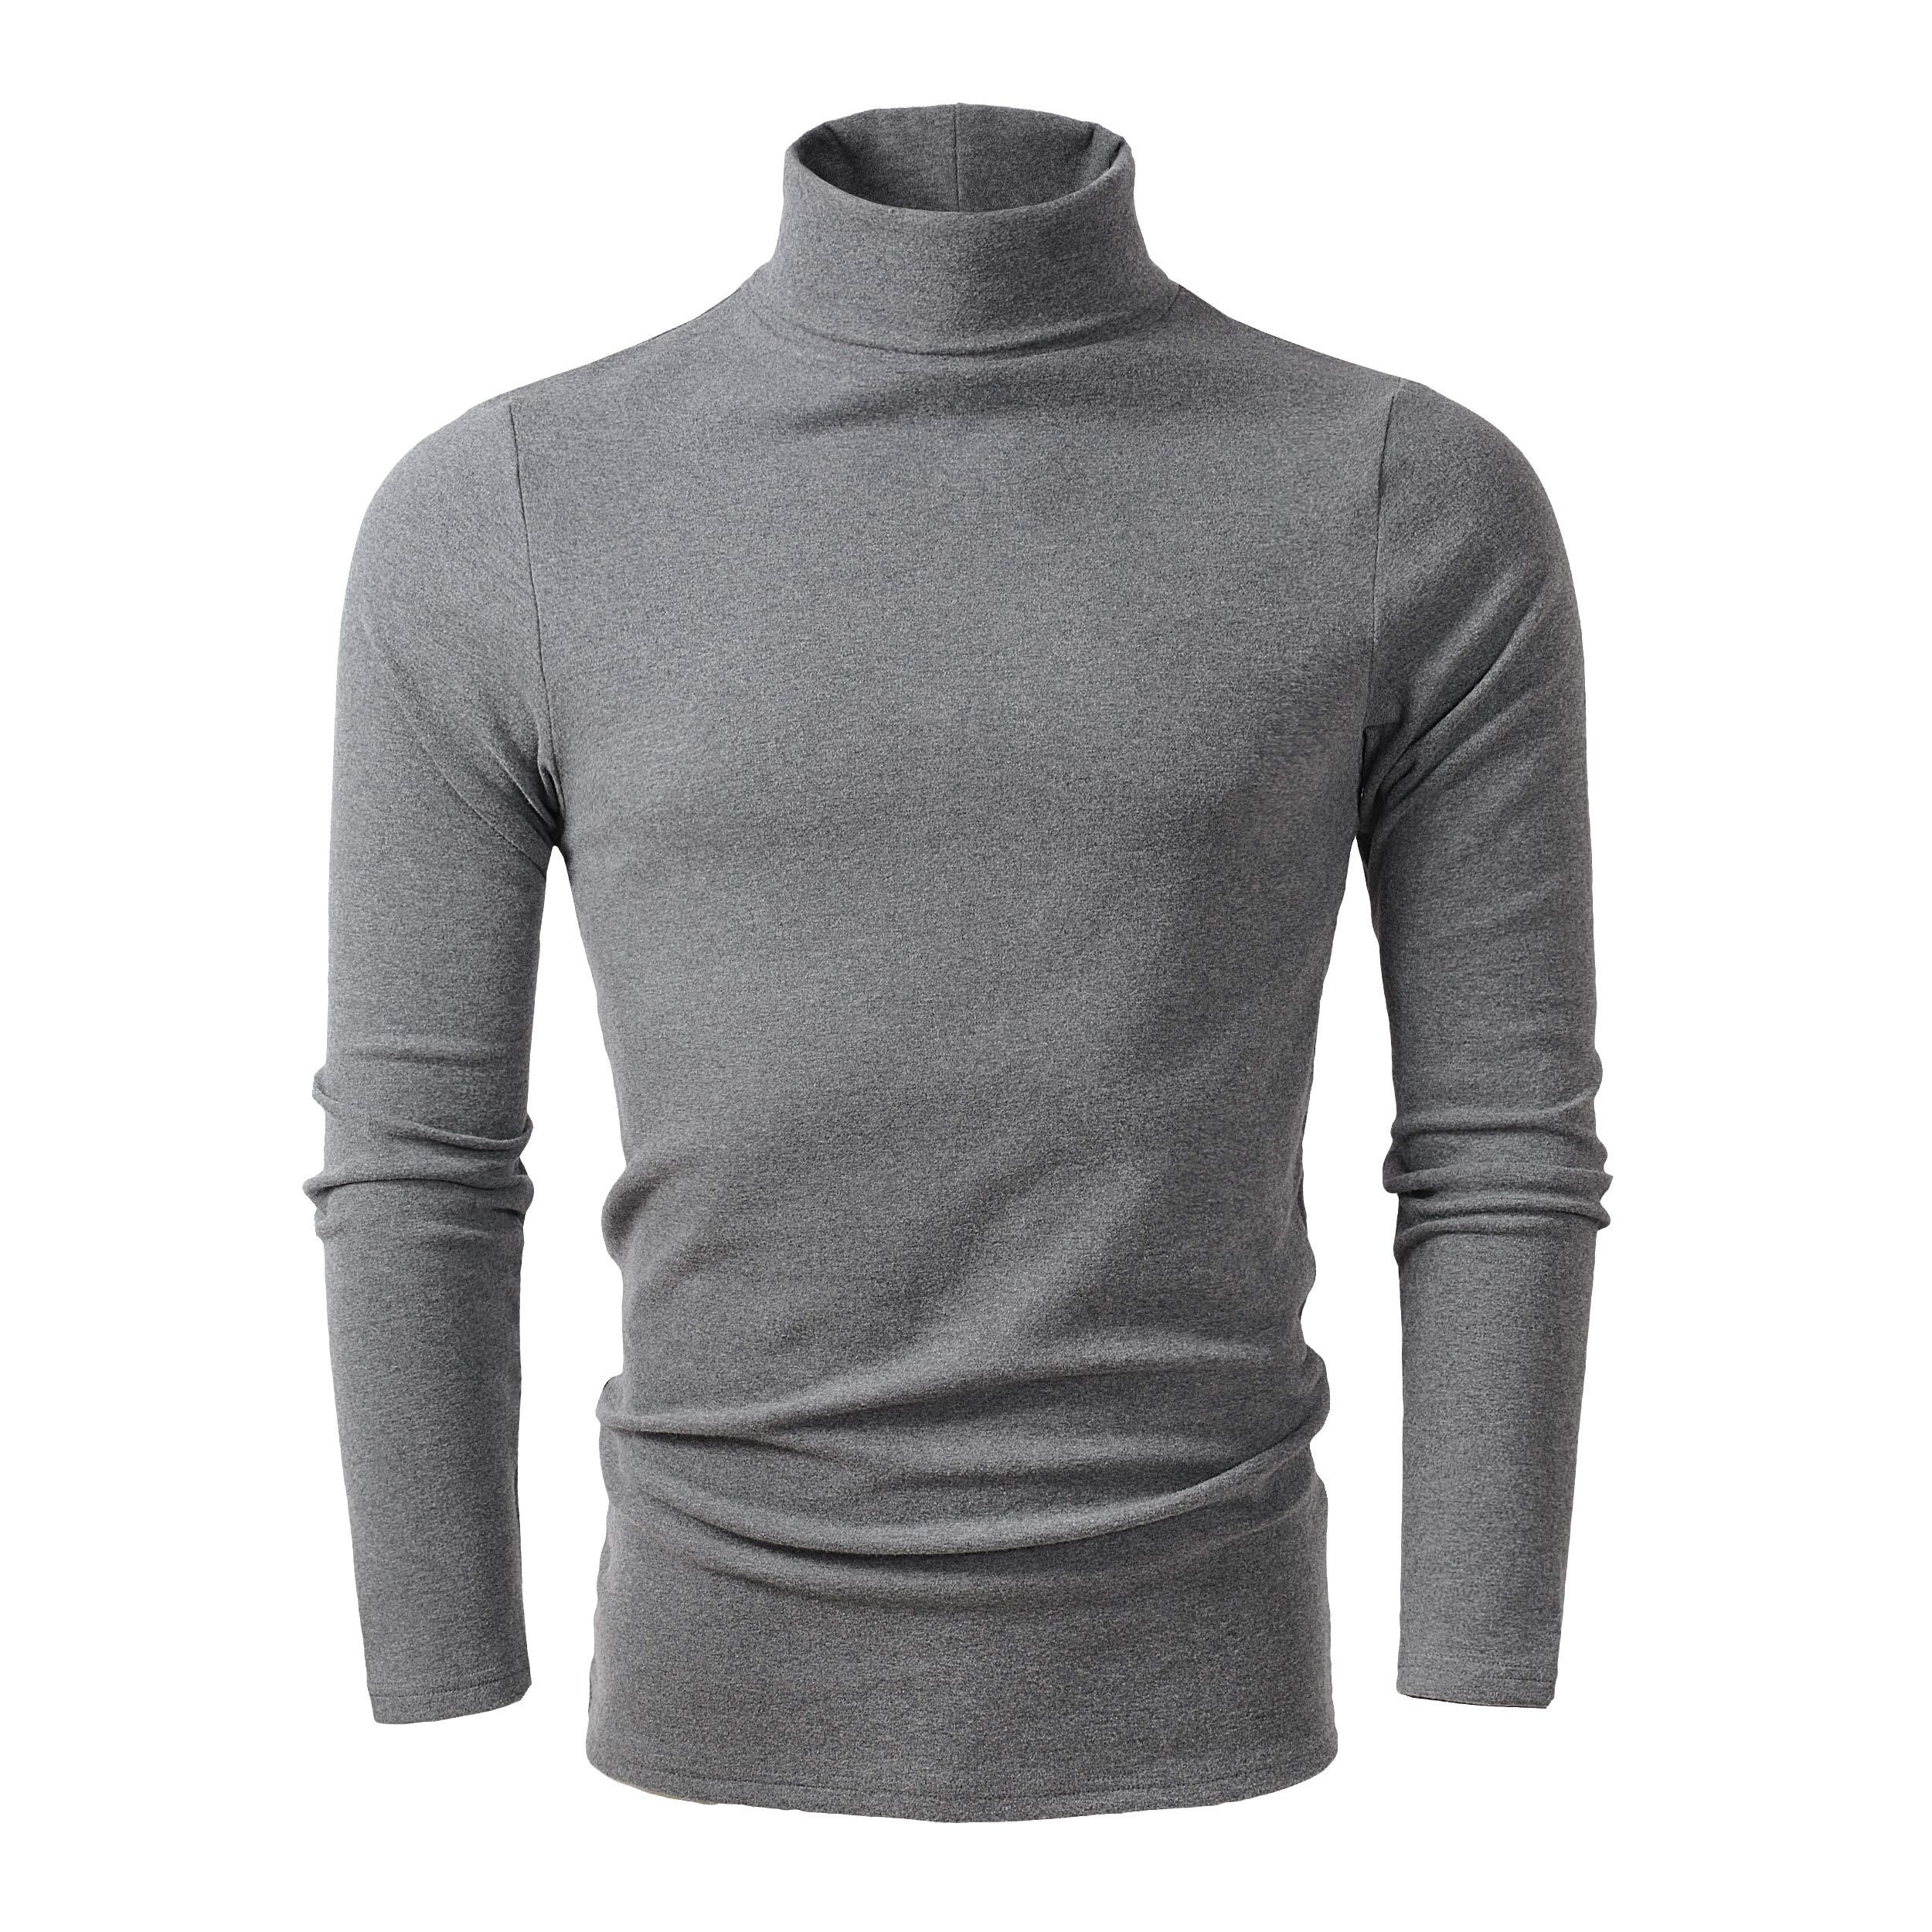 HieasyFit Men's Soft Cotton Turtleneck Tops Basic Layering Thermal Tee Dark Gray XL by HieasyFit